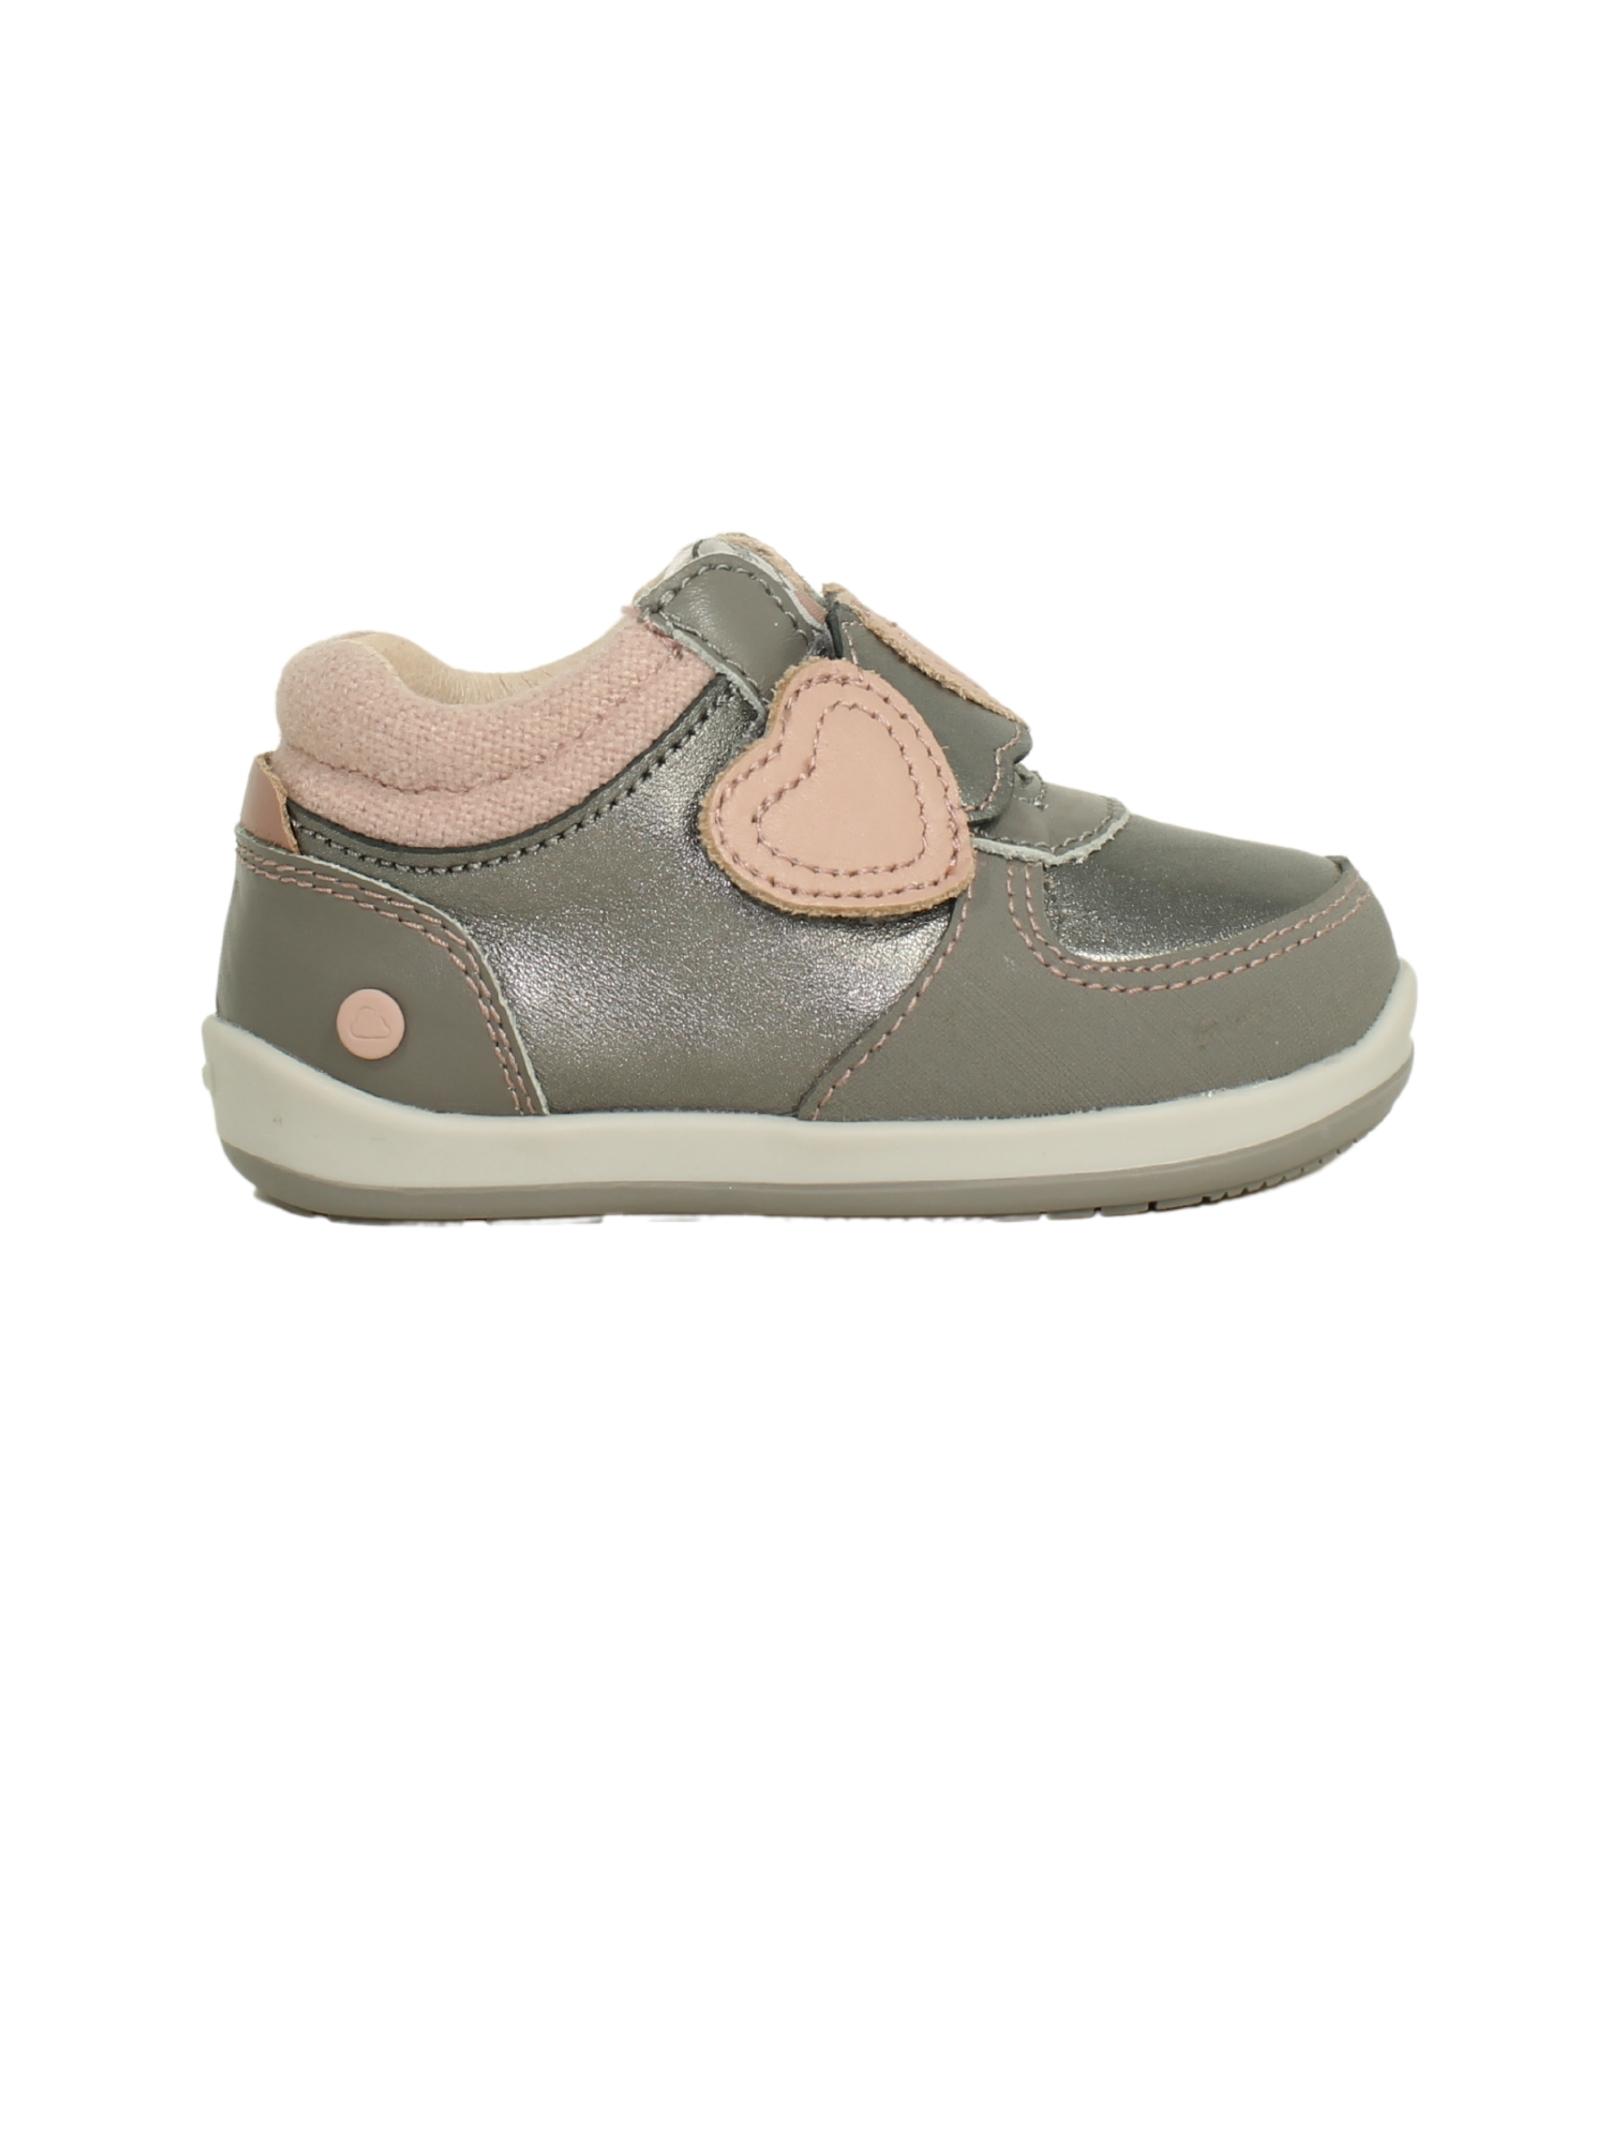 Sneakers cuori  Bambina MAYORAL   Sneakers   42212050